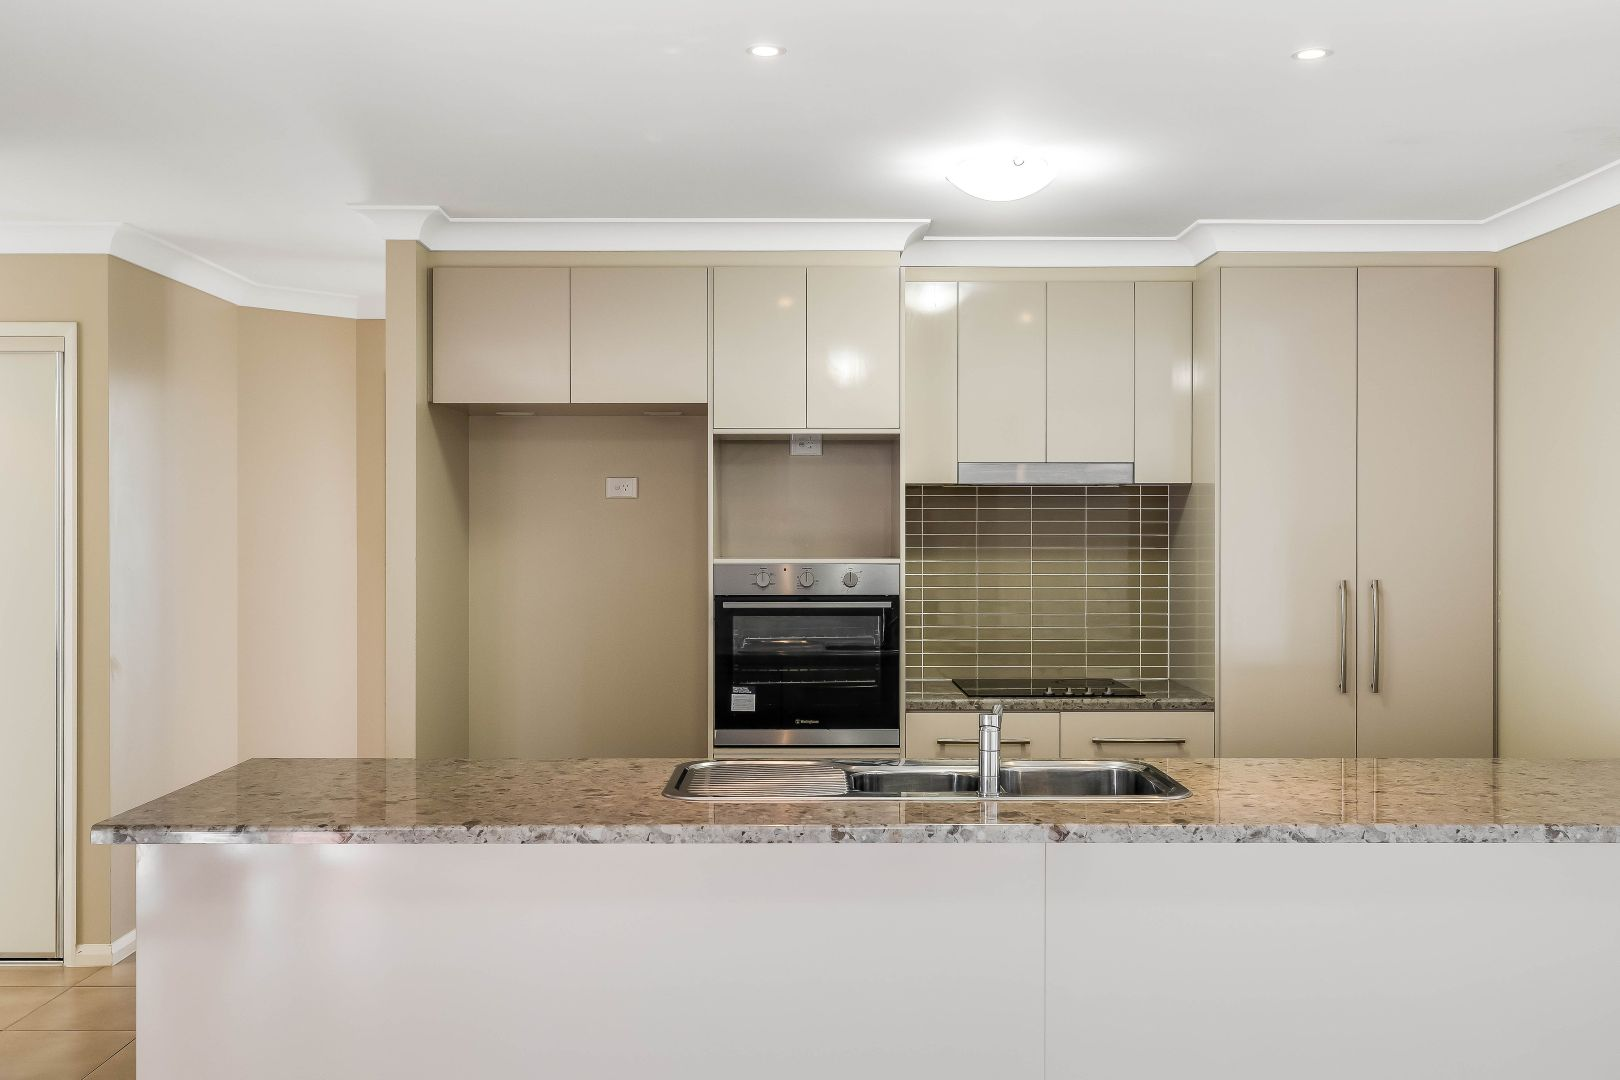 3/12 Garde Street, Centenary Heights QLD 4350, Image 1